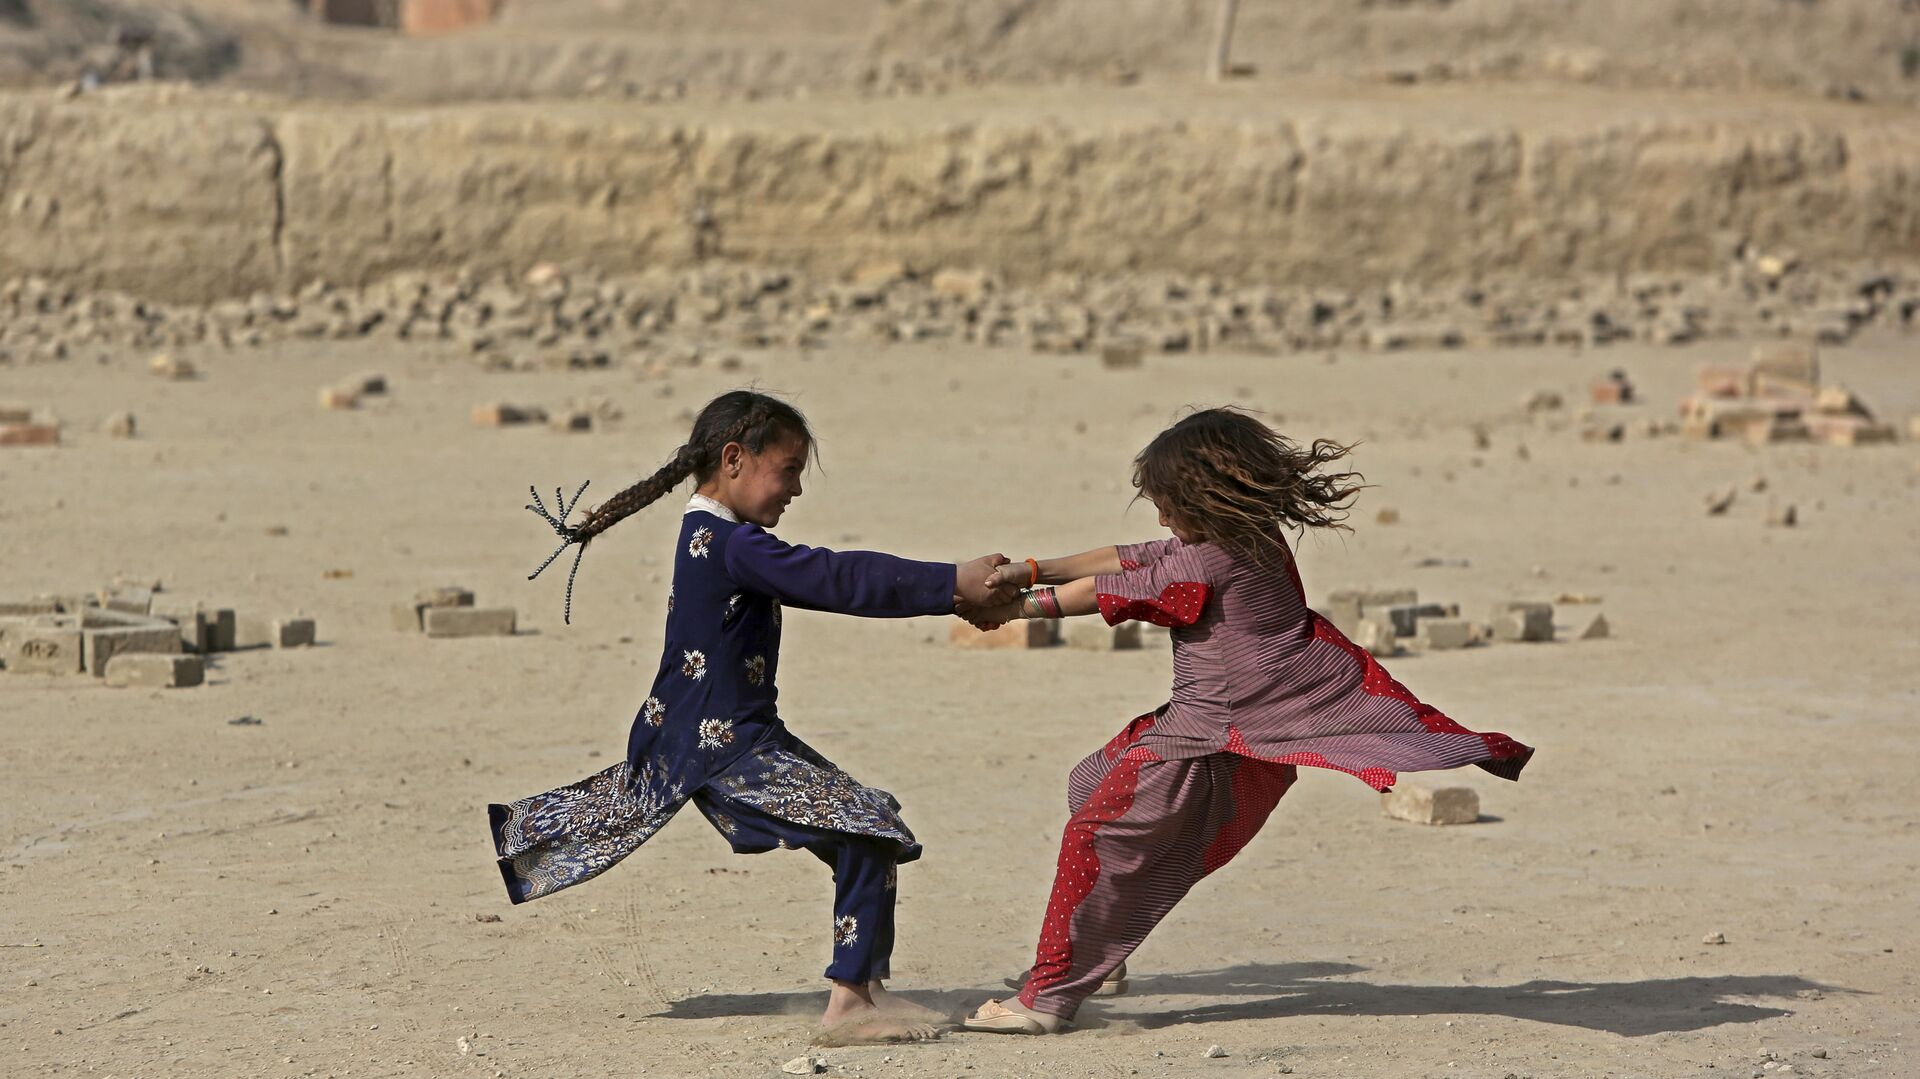 Bambine afghane giocano in periferia di Kabul, Afghanistan - Sputnik Italia, 1920, 04.09.2021